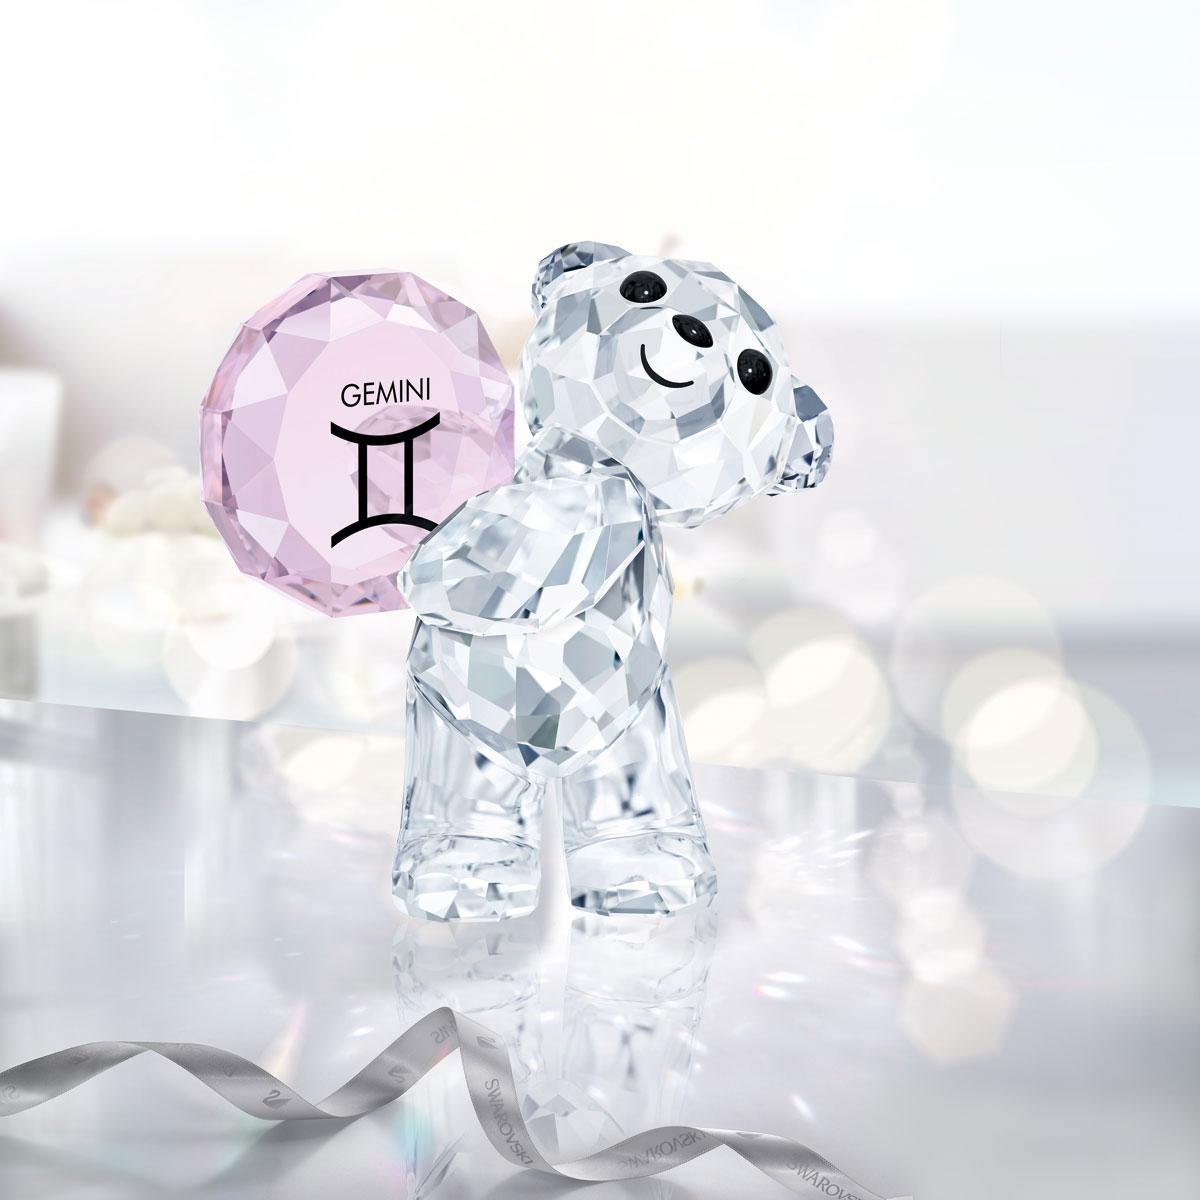 Swarovski Crystal Kris Bear Horoscope Gemini Crystal Sculpture